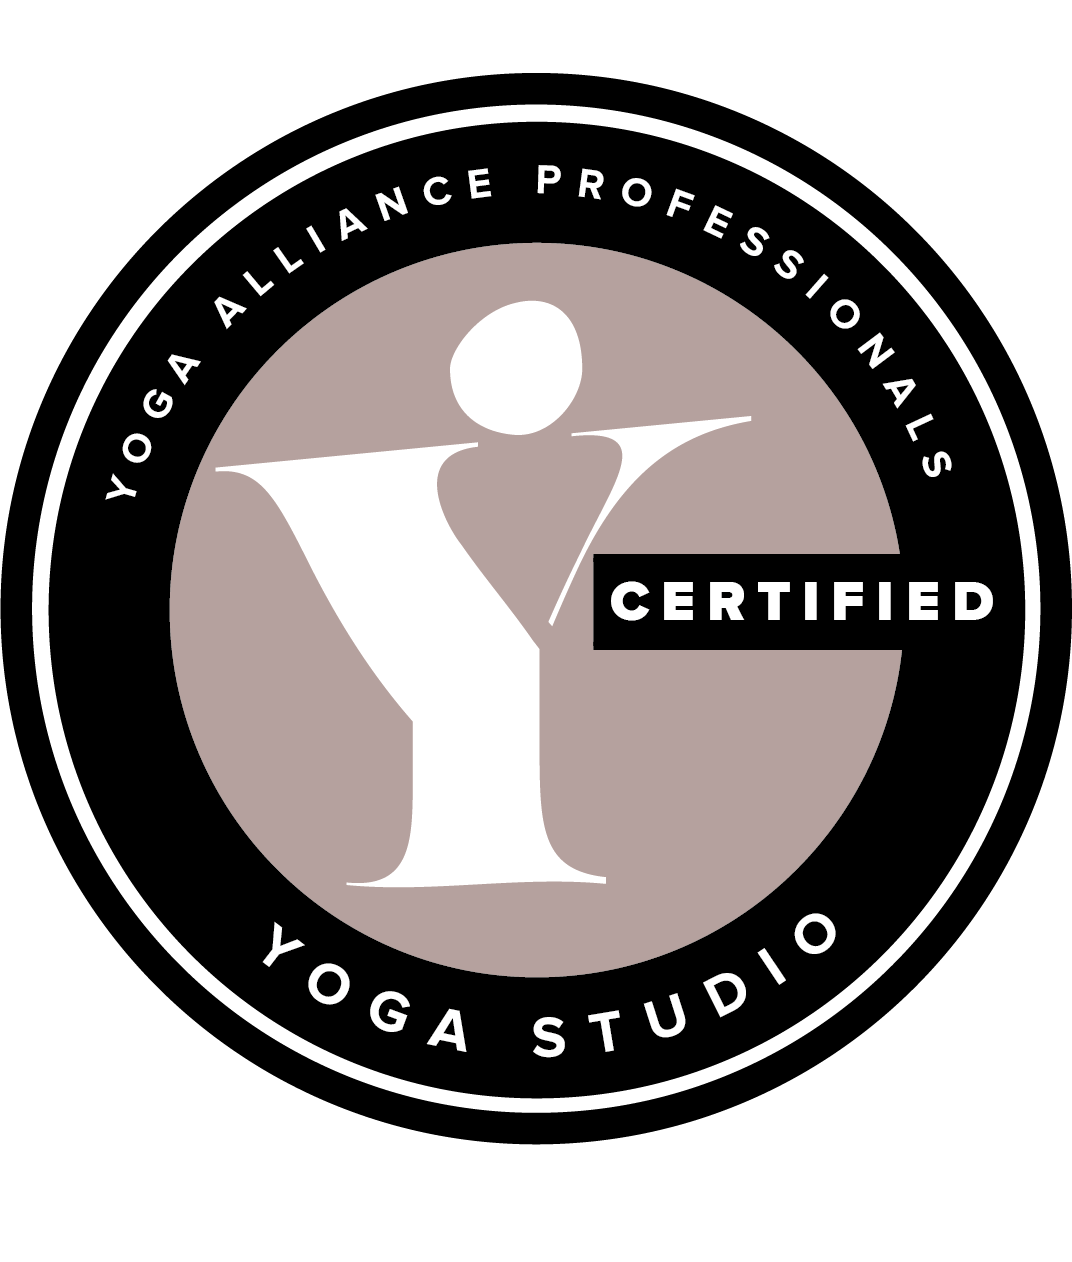 YogaStudio.png